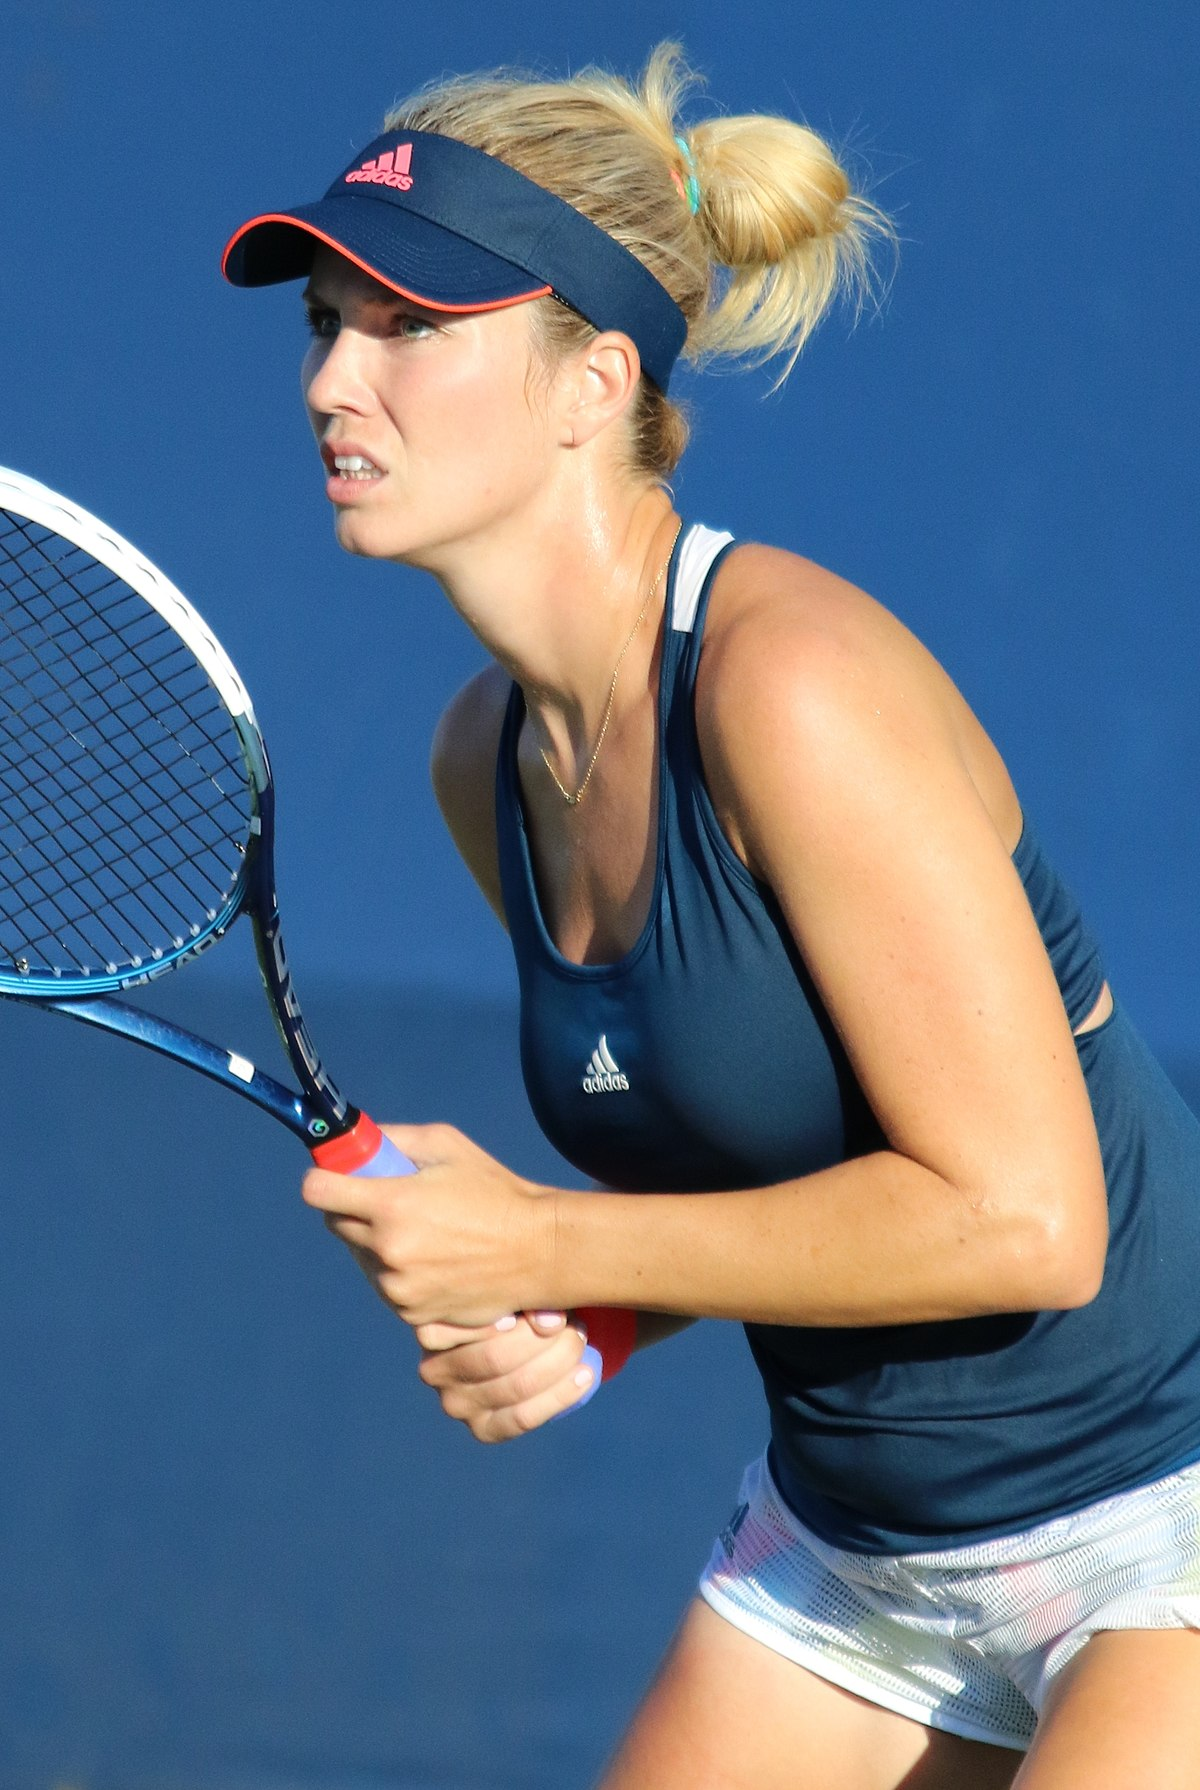 Tennisspielerin Sofia